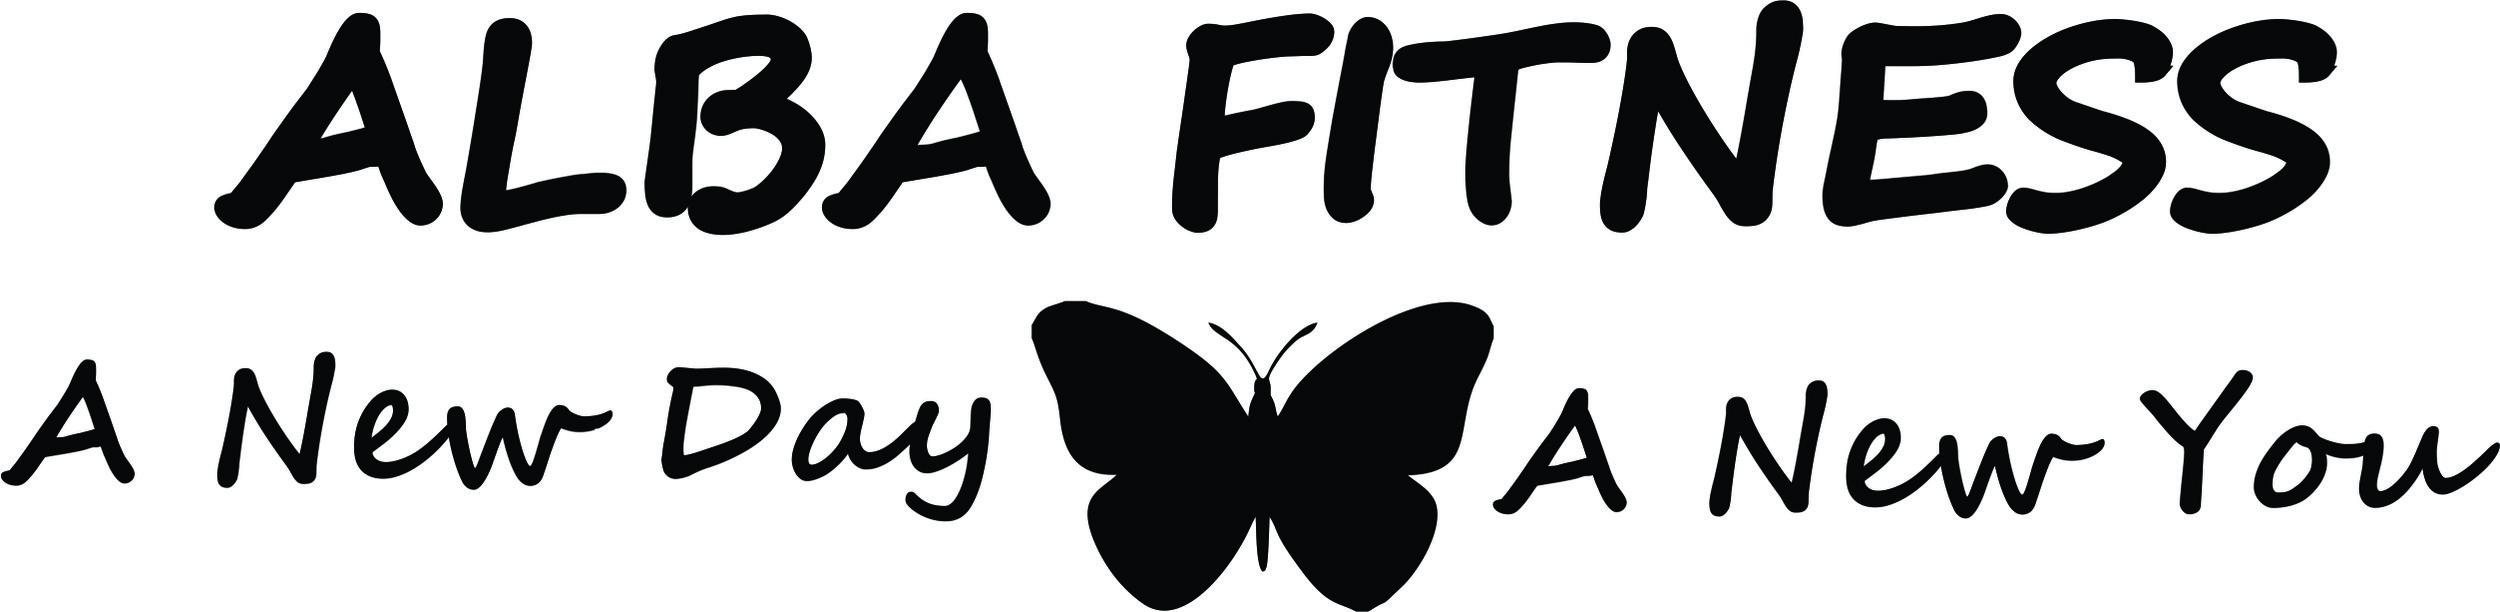 Alba Fitness Logo - 7-10-14 copy.jpg